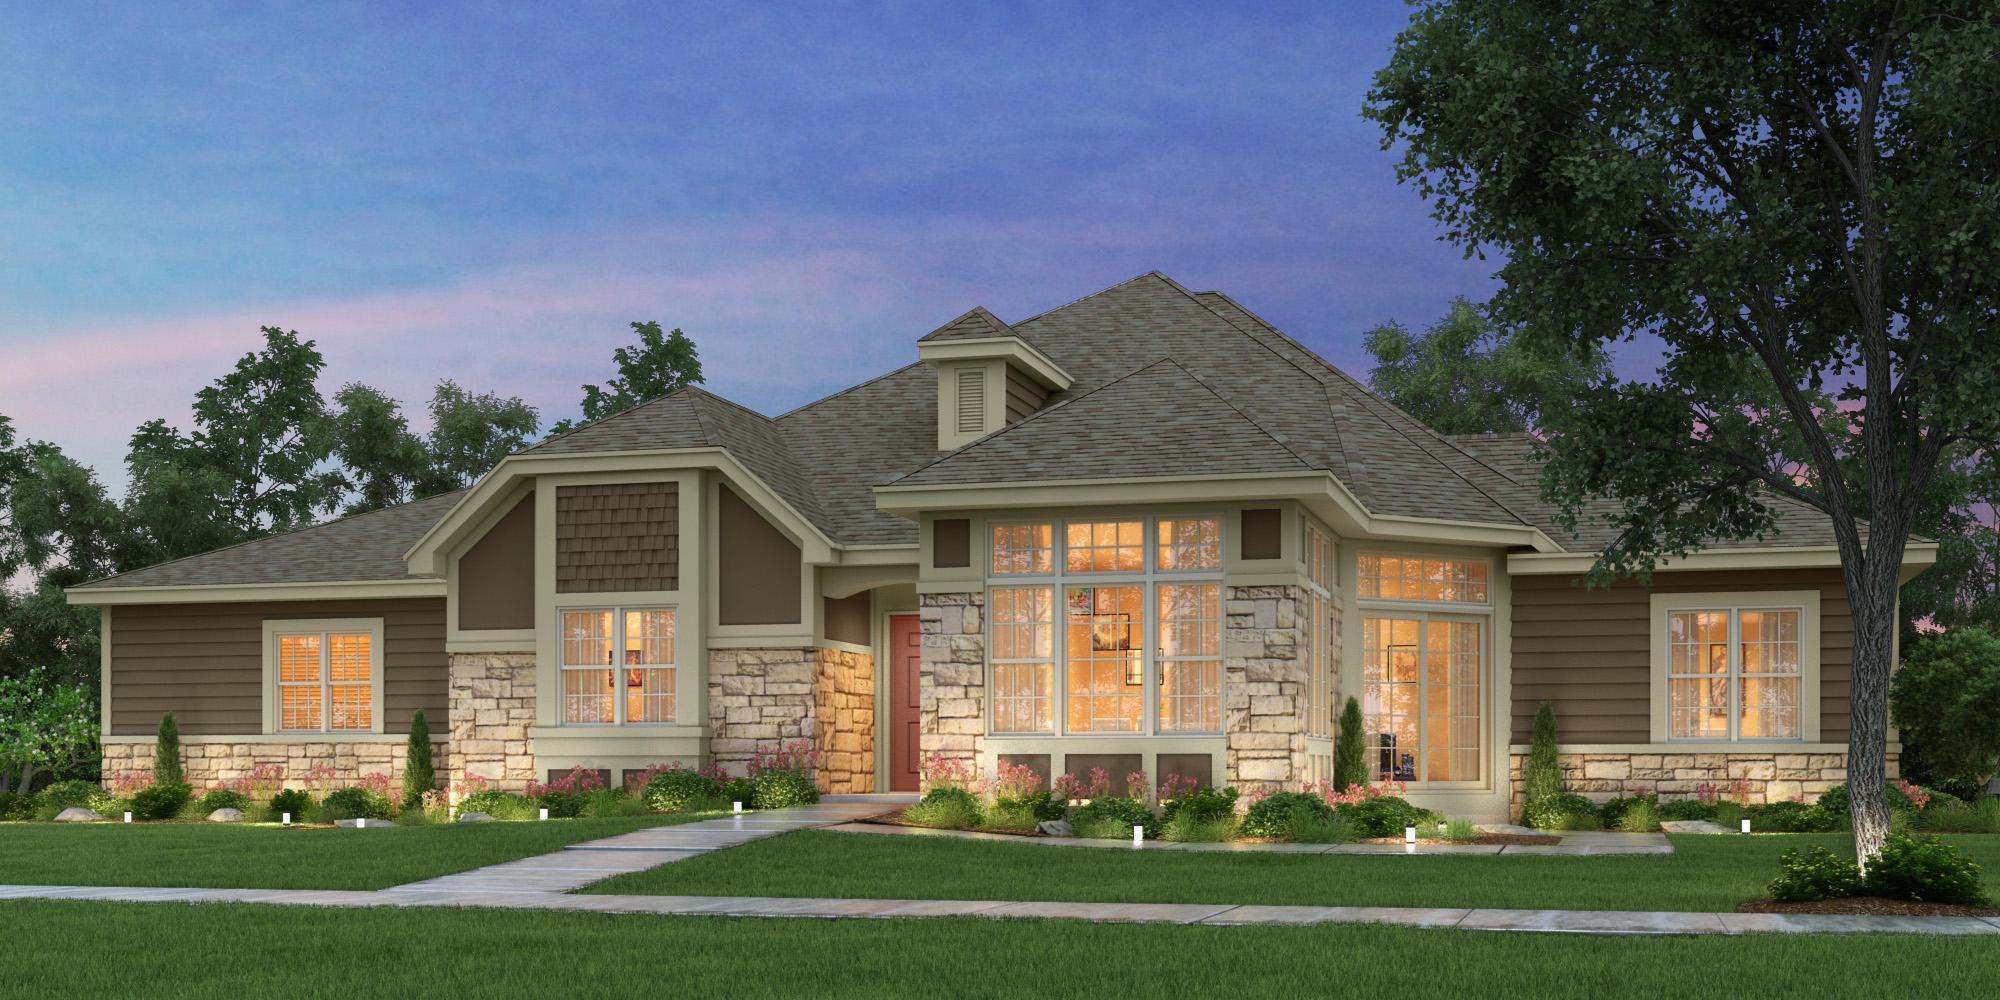 4365 Nighthawk Trl, Brookfield, Wisconsin 53005, 2 Bedrooms Bedrooms, 7 Rooms Rooms,3 BathroomsBathrooms,Condominiums,For Sale,Nighthawk Trl,1,1717149